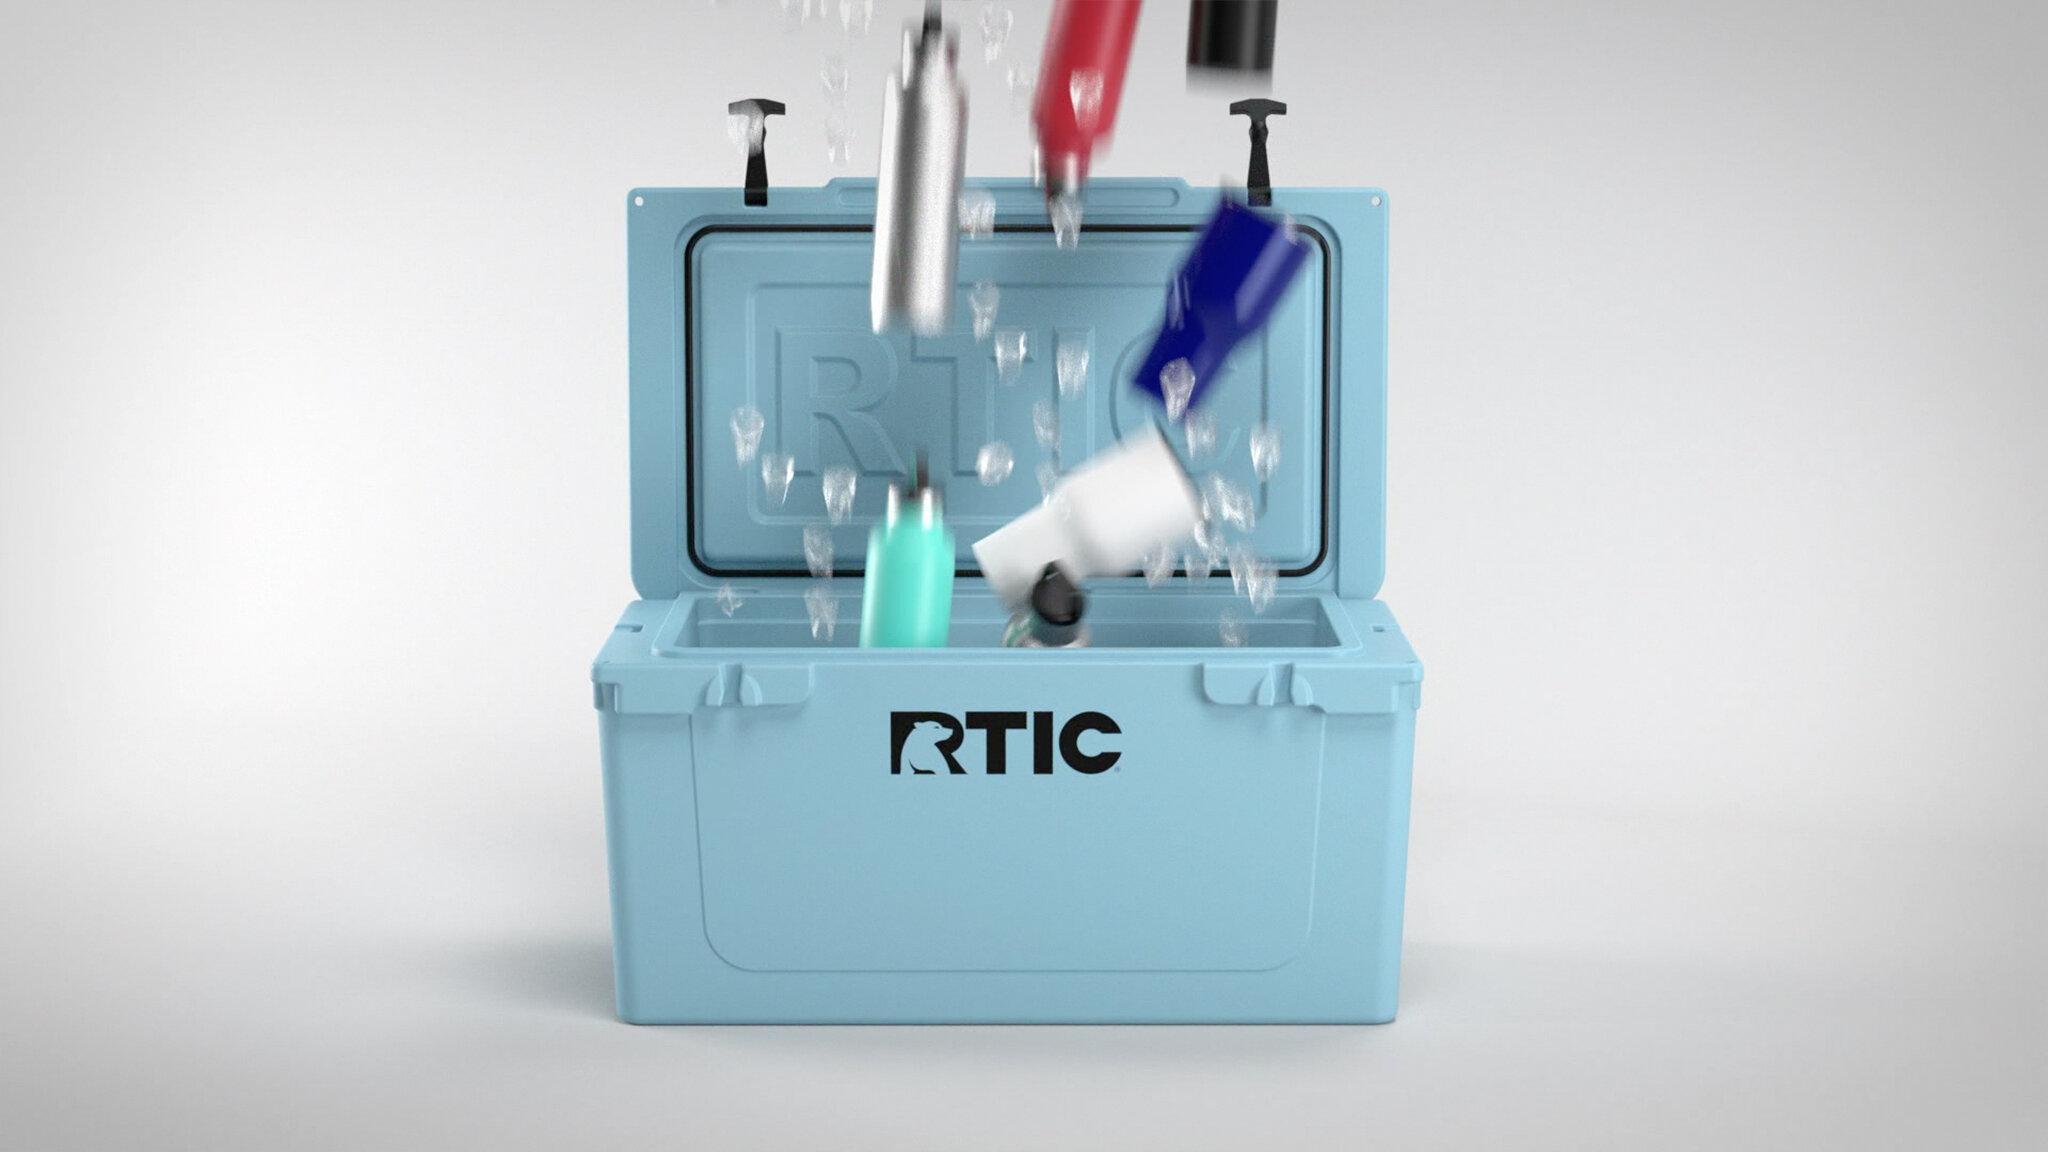 rtic-tv_texans1-2k_f2.jpg